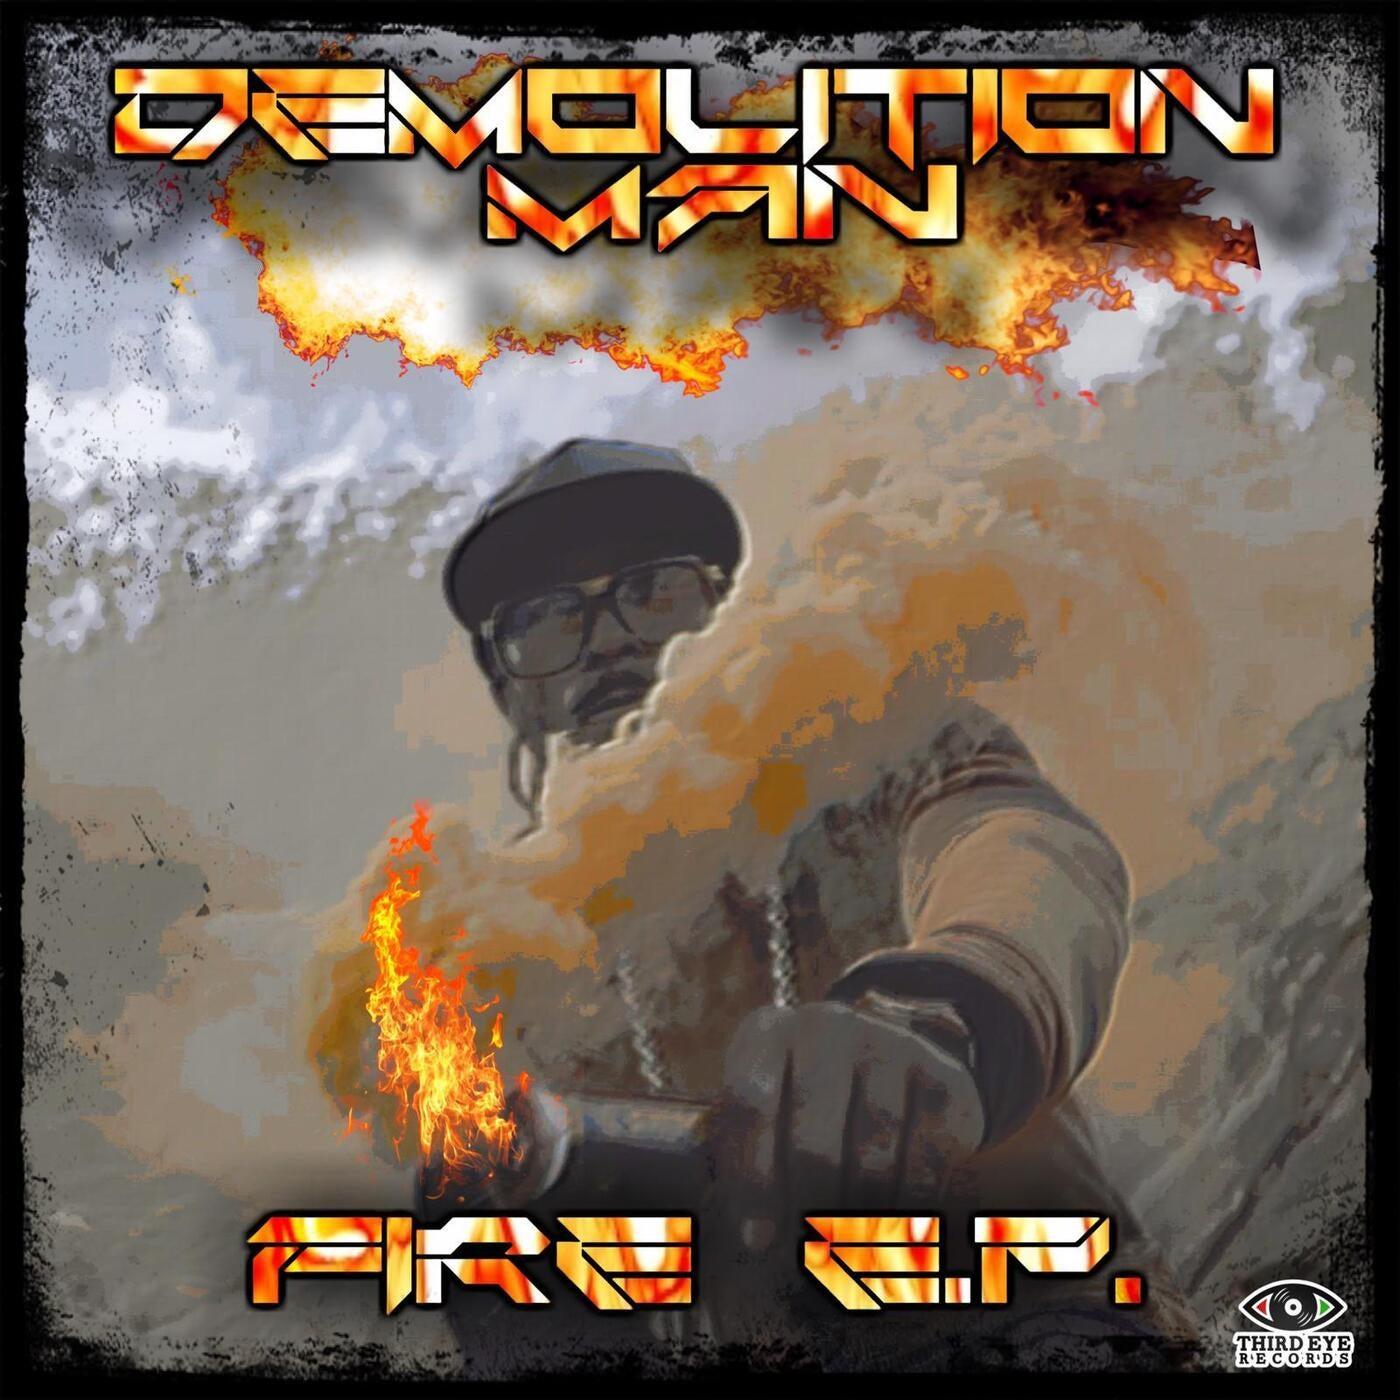 Fire feat. Cutty Ranks feat. Inja